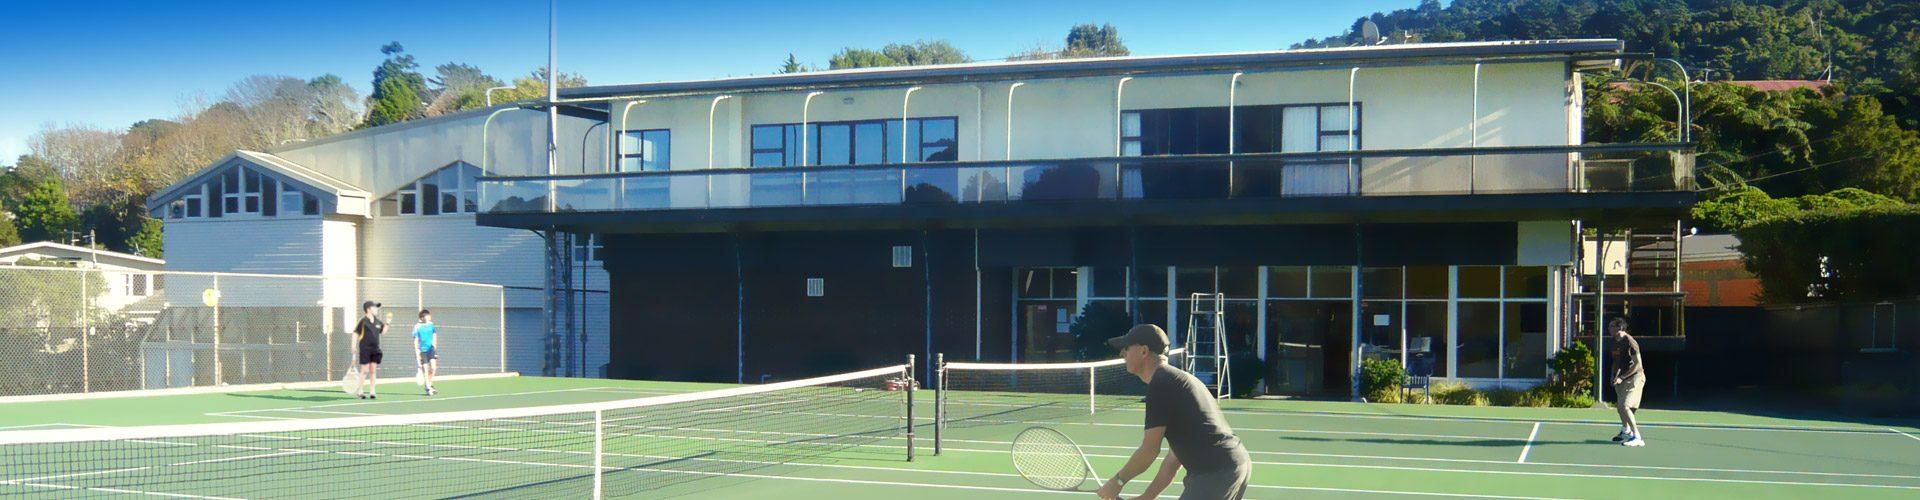 Khandallah Tennis & Squash Club